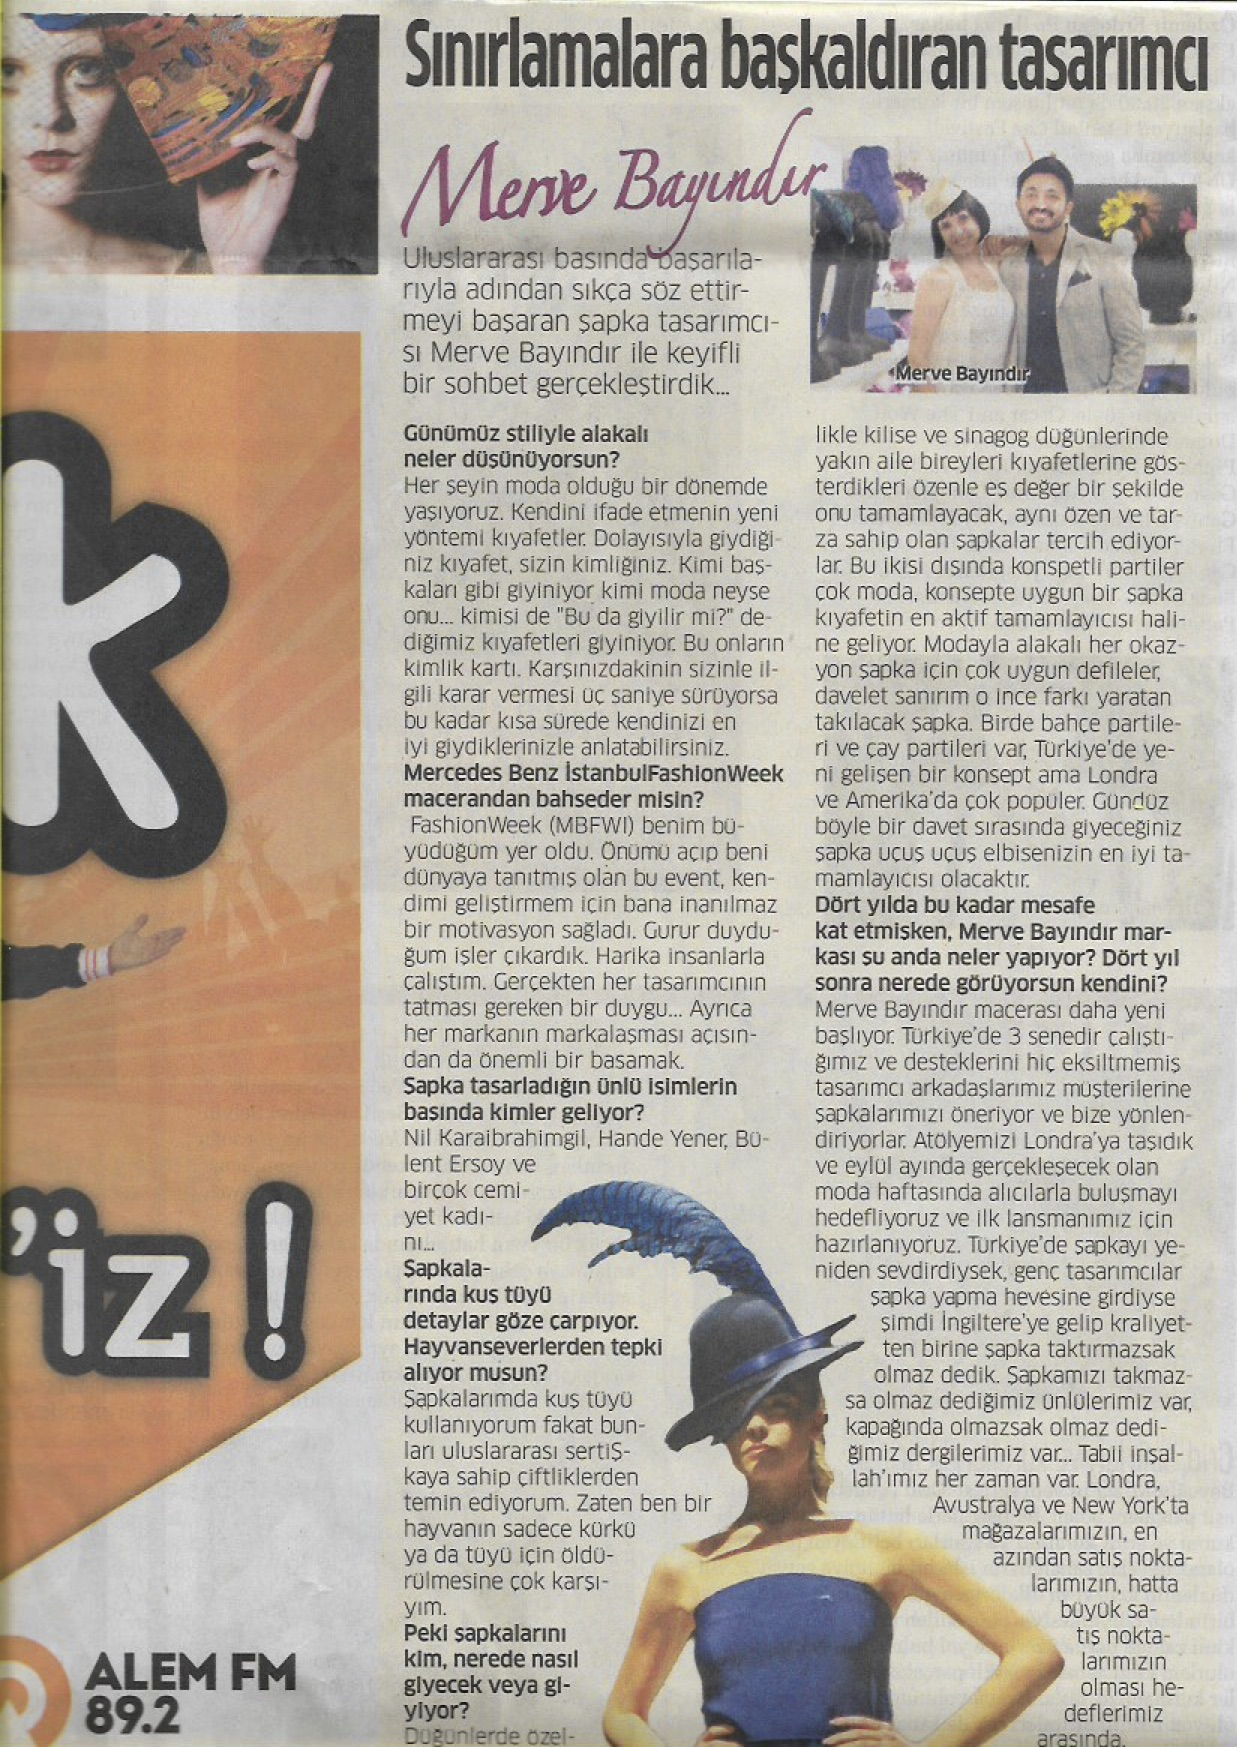 Aksam Newspaper Umit Temurcin and Merve Bayindir interview